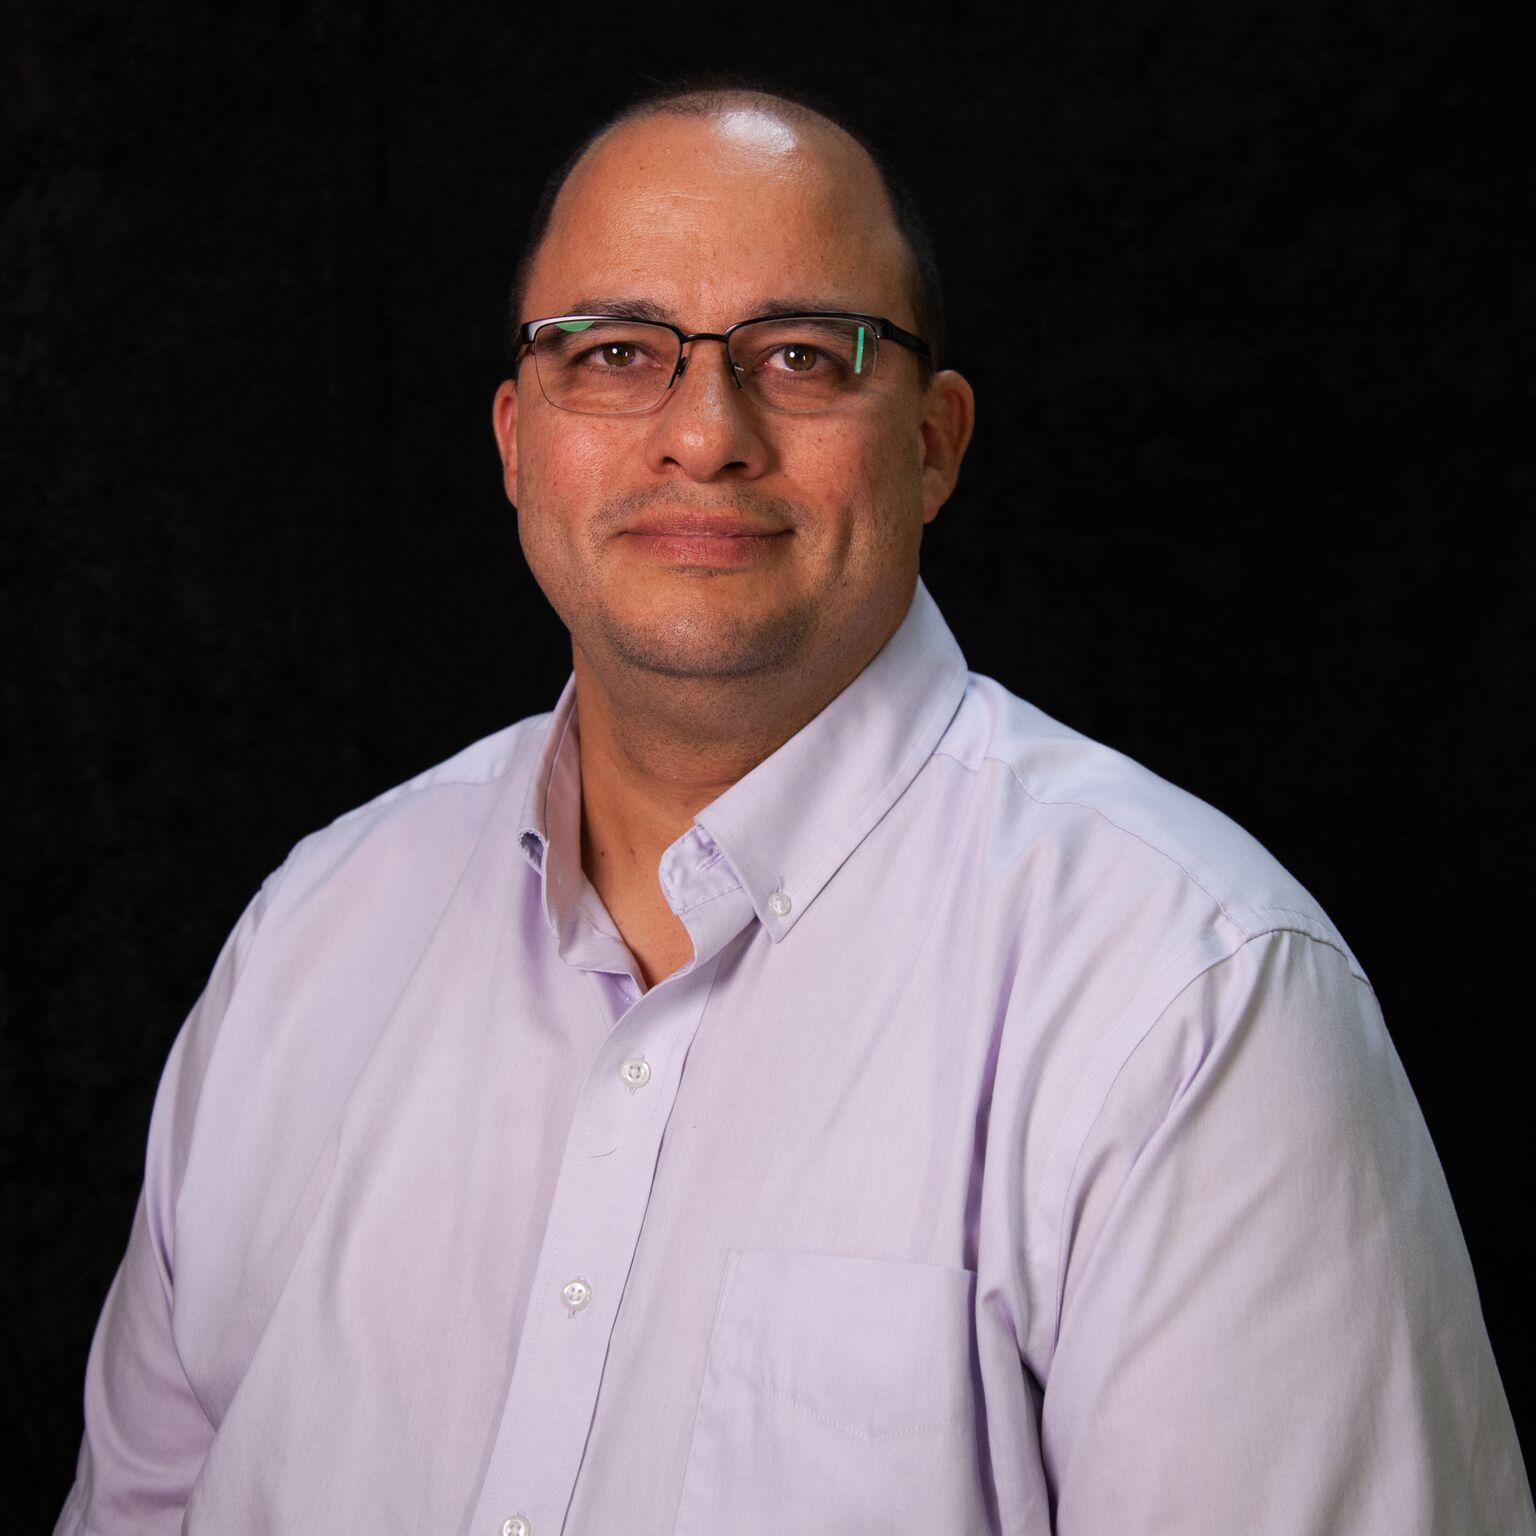 John Romero, Environmental, Health & Safety Manager